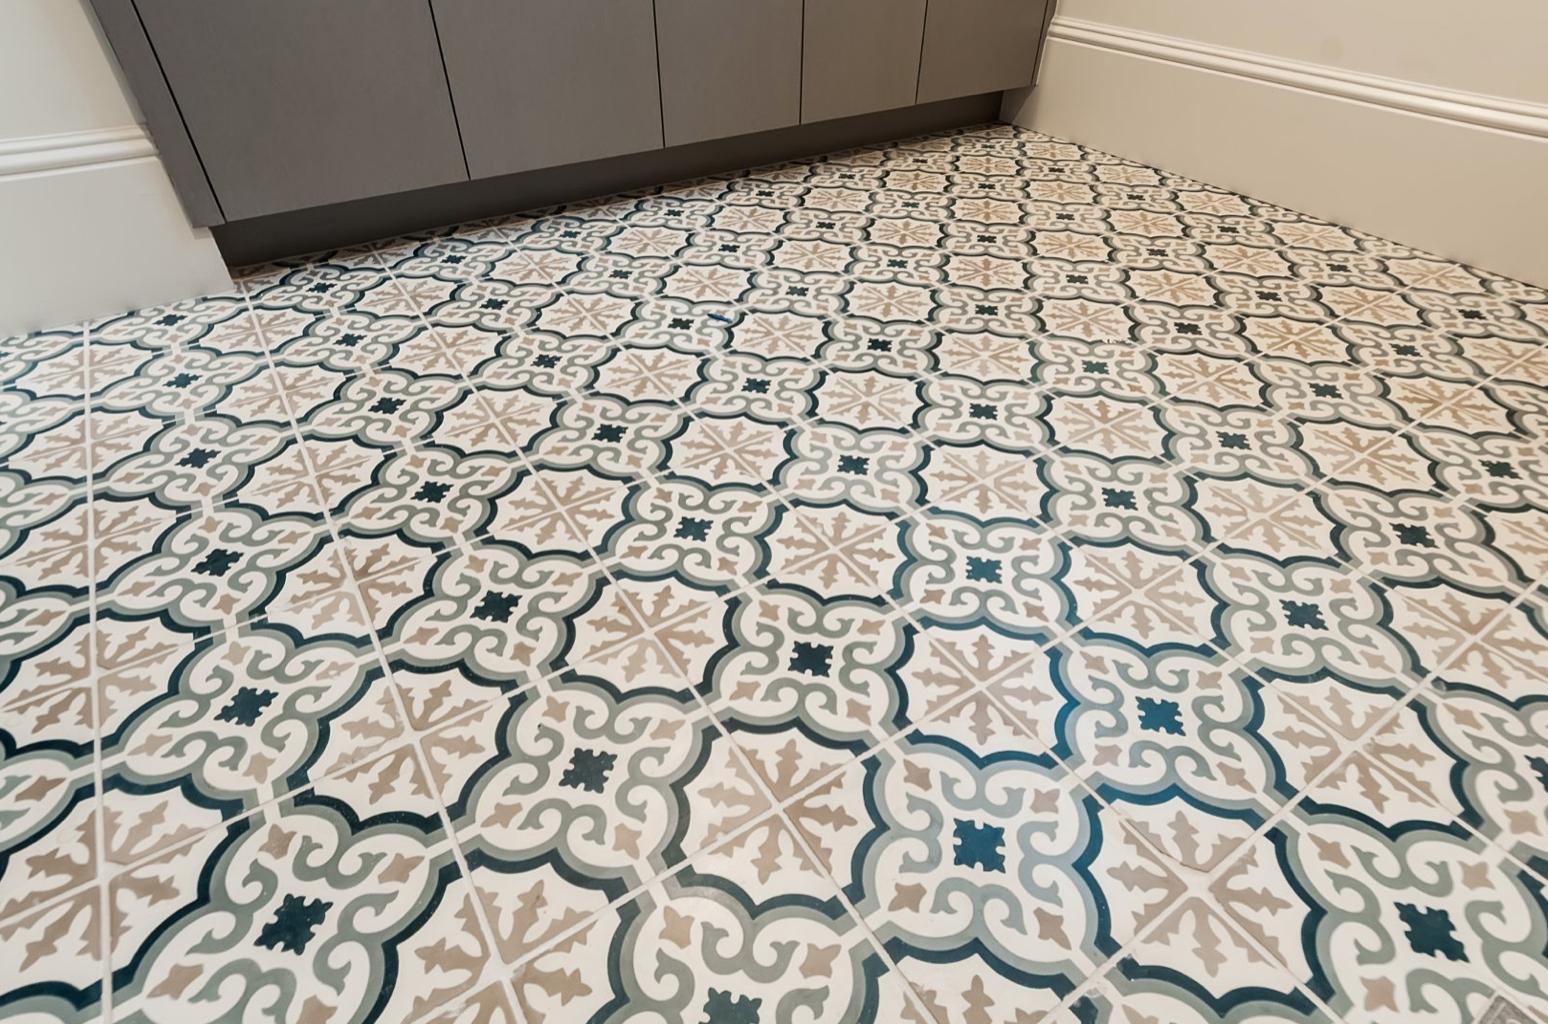 ceramic mosaic tile flooring in modern